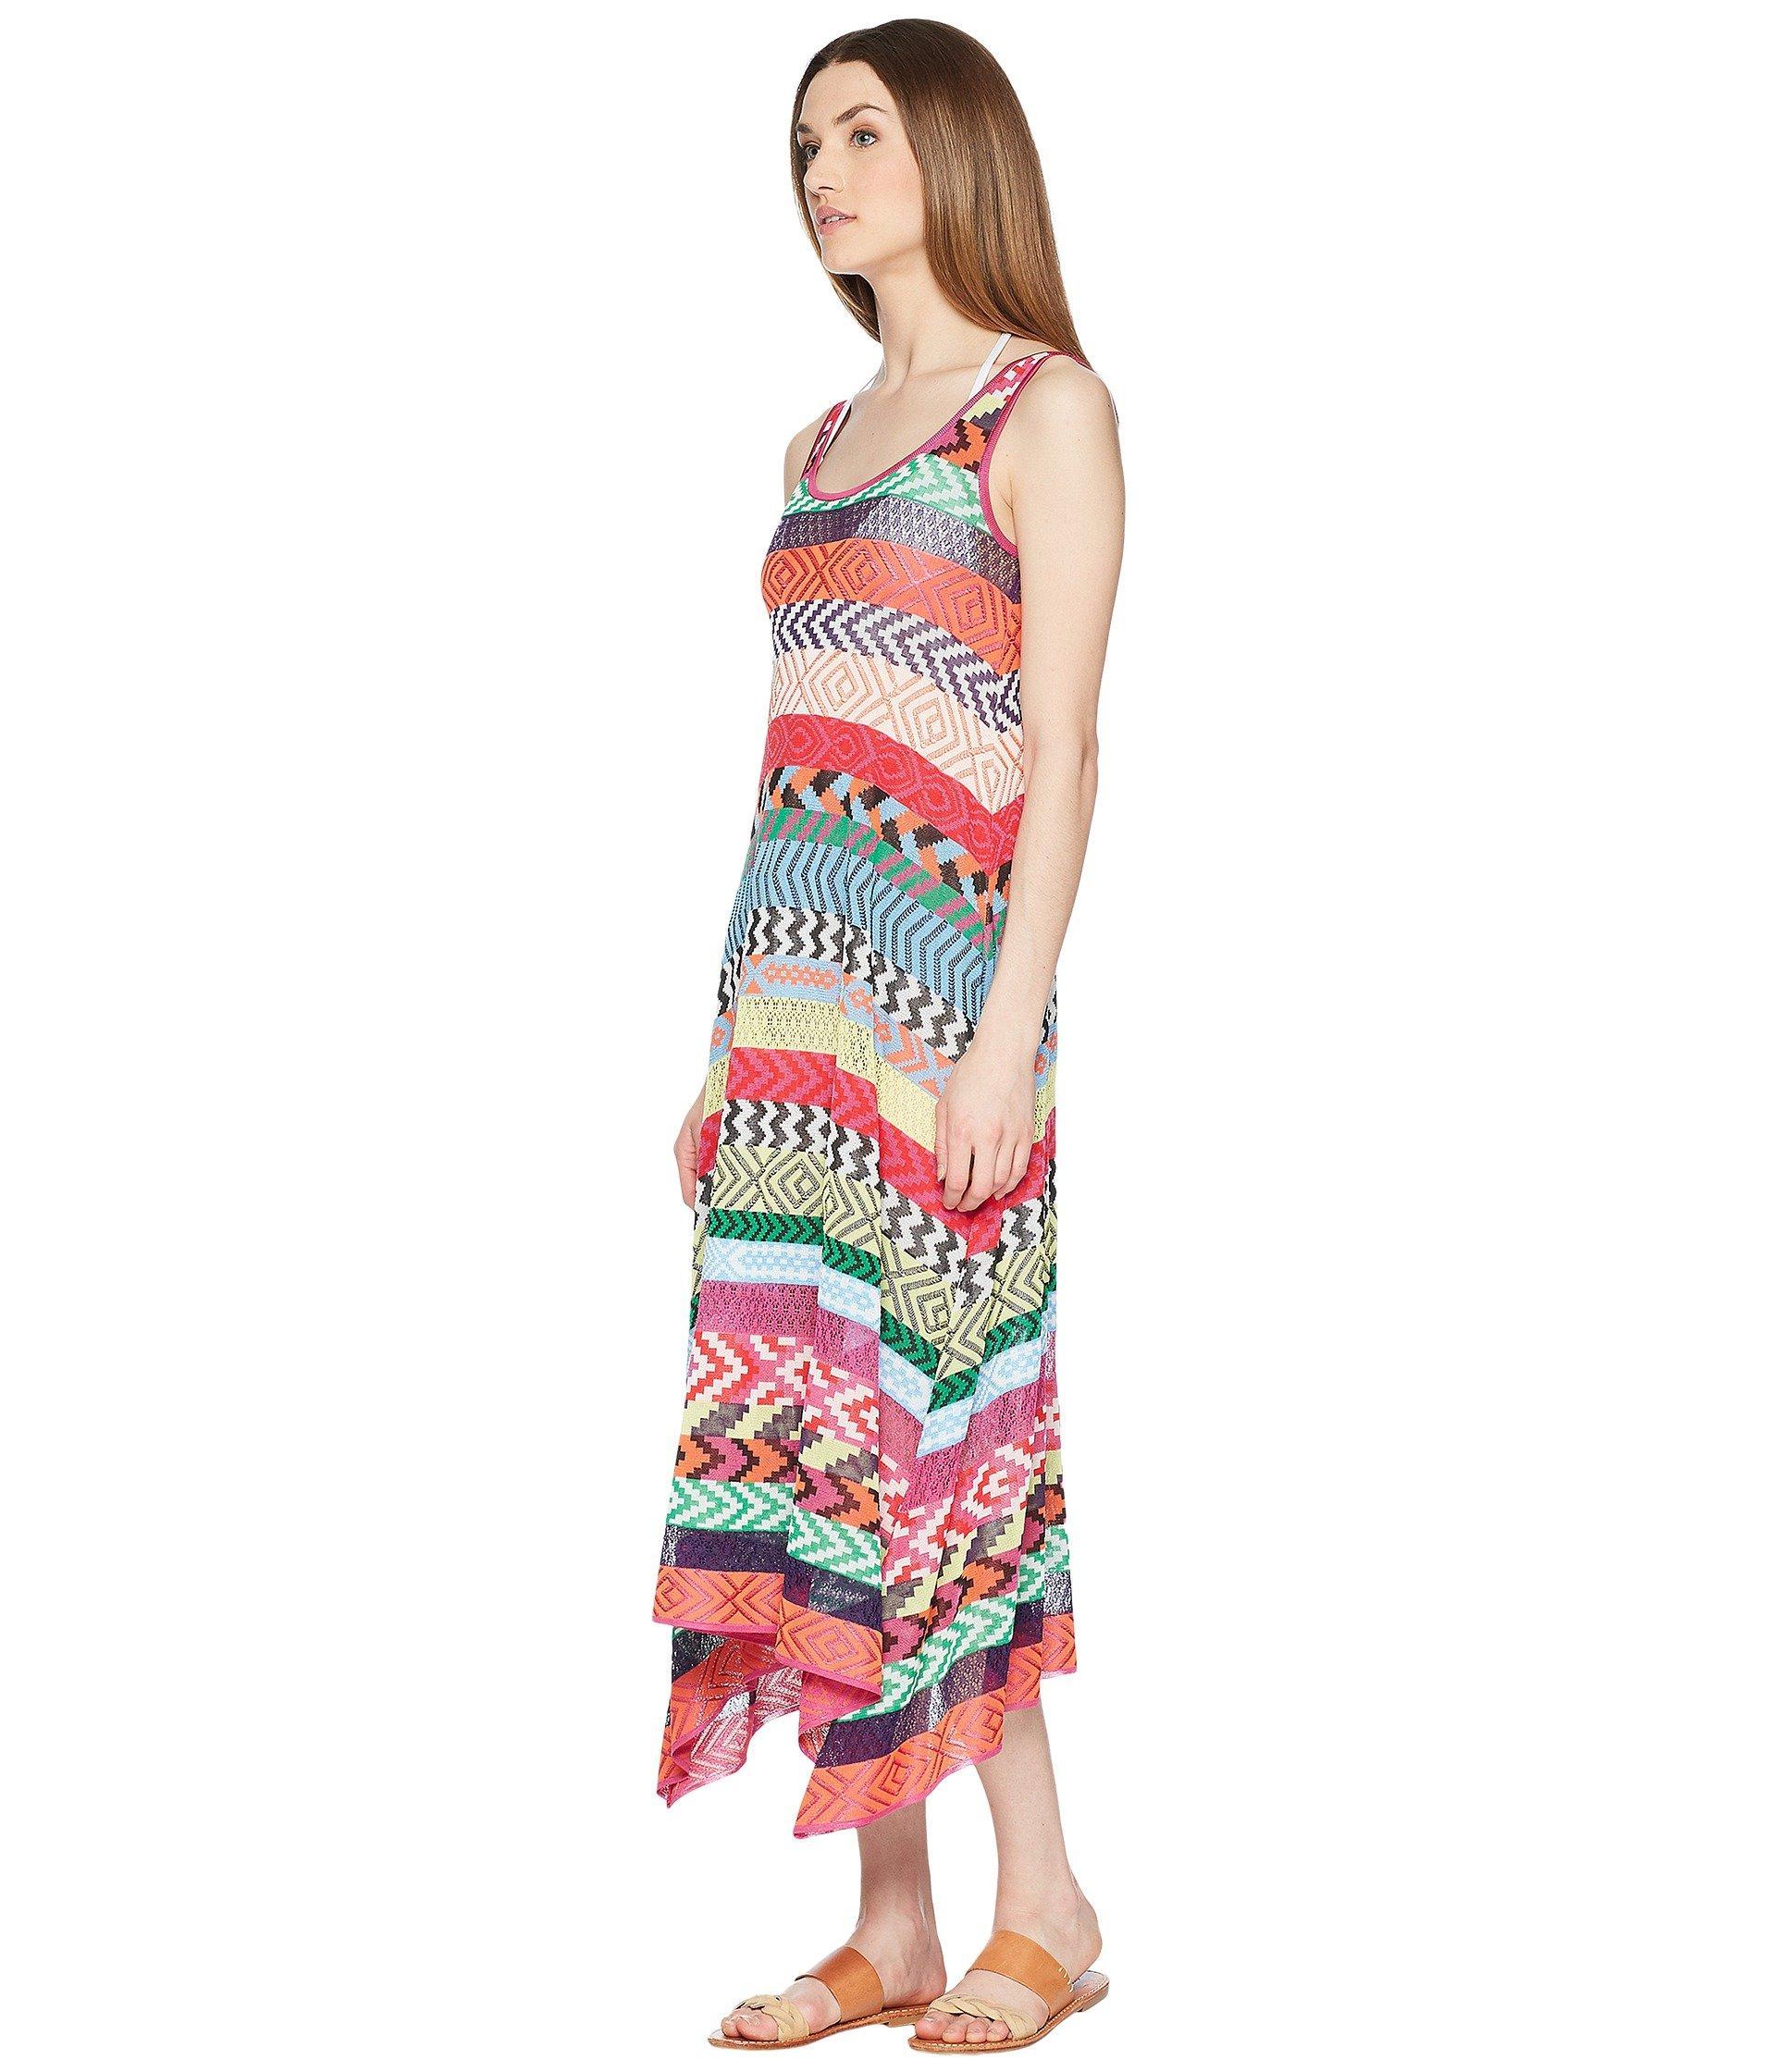 fe15b13e0f6 Lyst - Mary Katrantzou Leandra Dress Fira Stripe Knit Cover-up in Red -  Save 50%